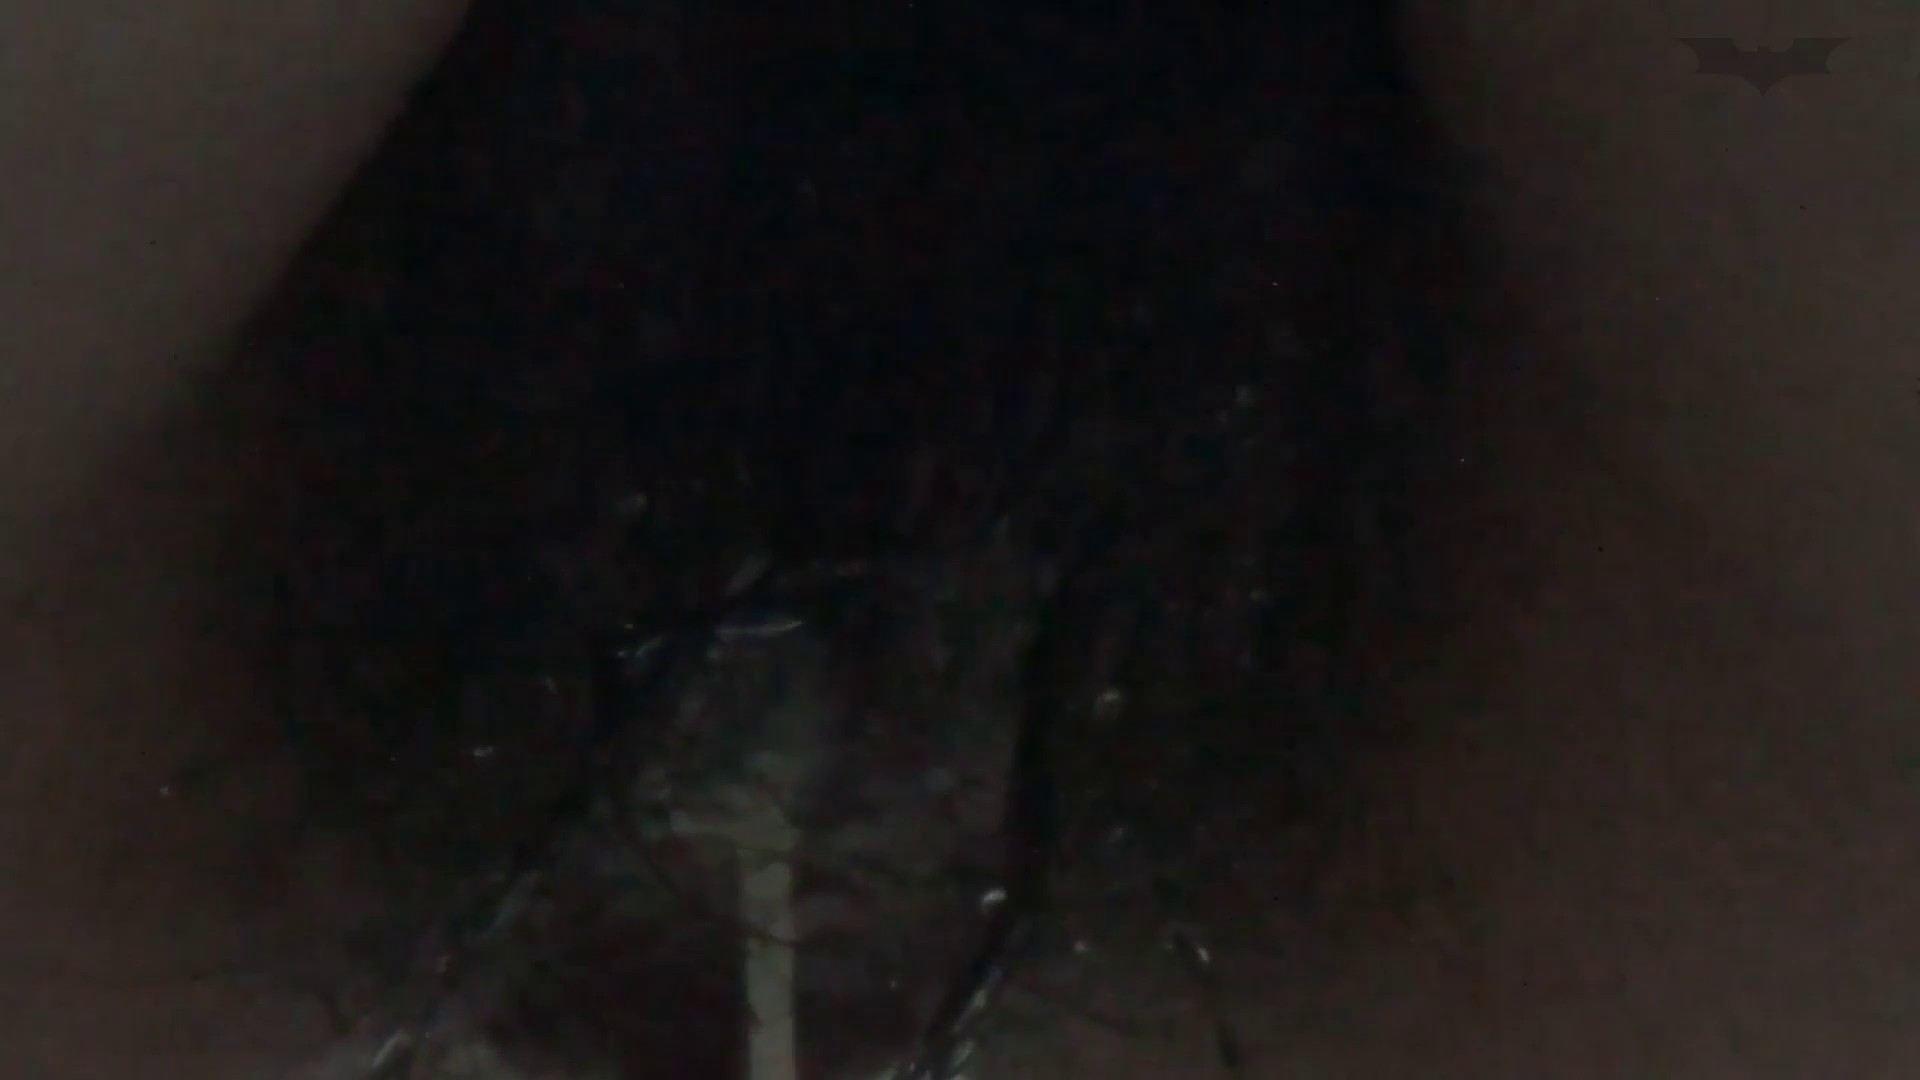 JD盗撮 美女の洗面所の秘密 Vol.64 高評価 ぱこり動画紹介 81画像 76